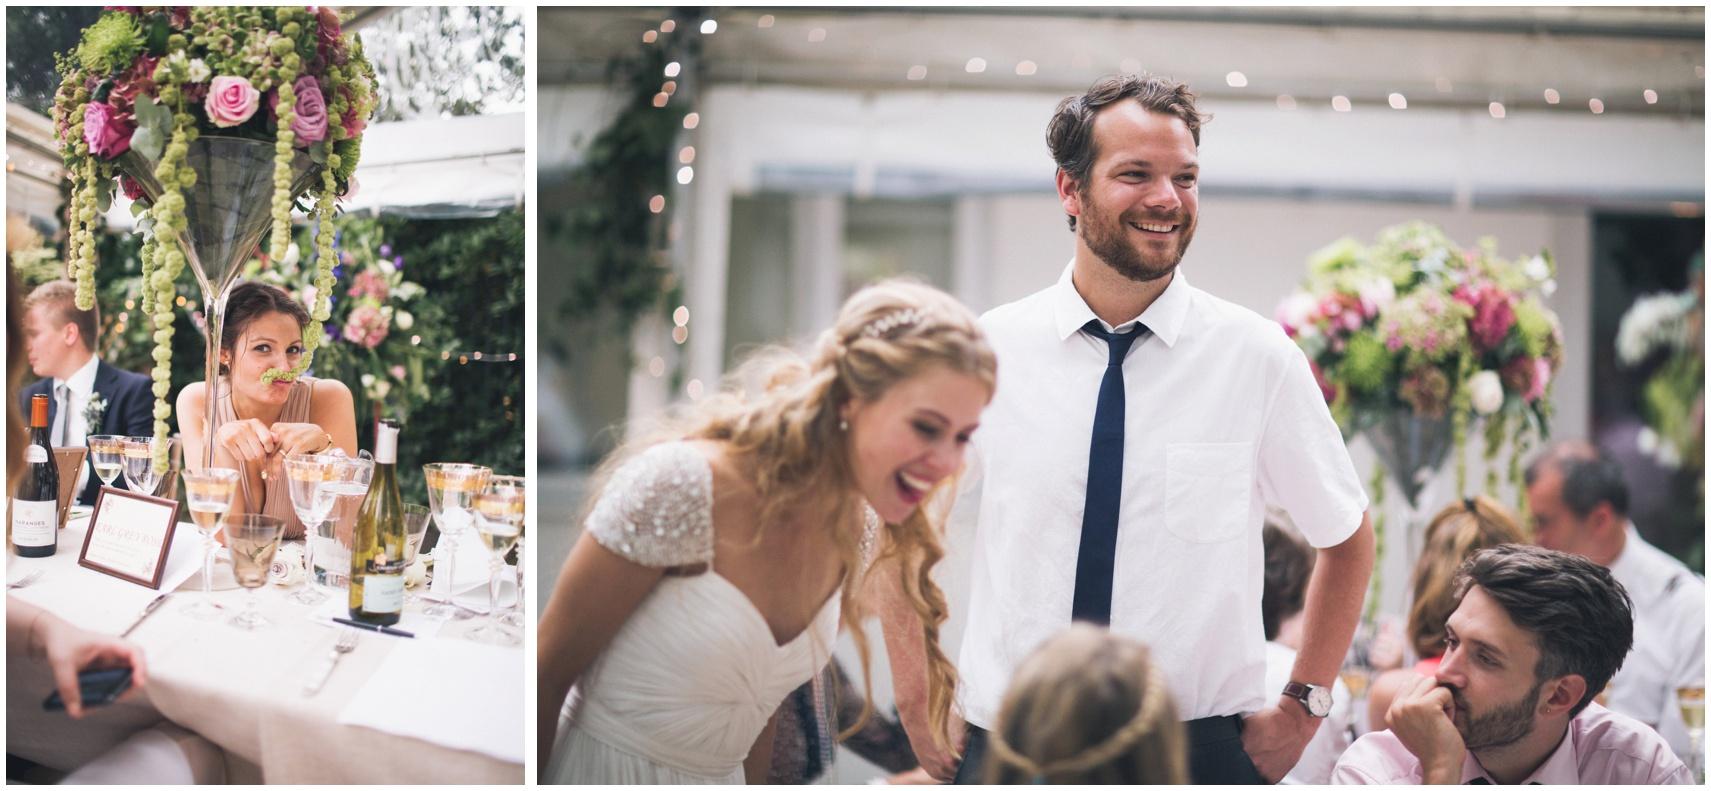 BMC Wedding photography Rutland_0336.jpg